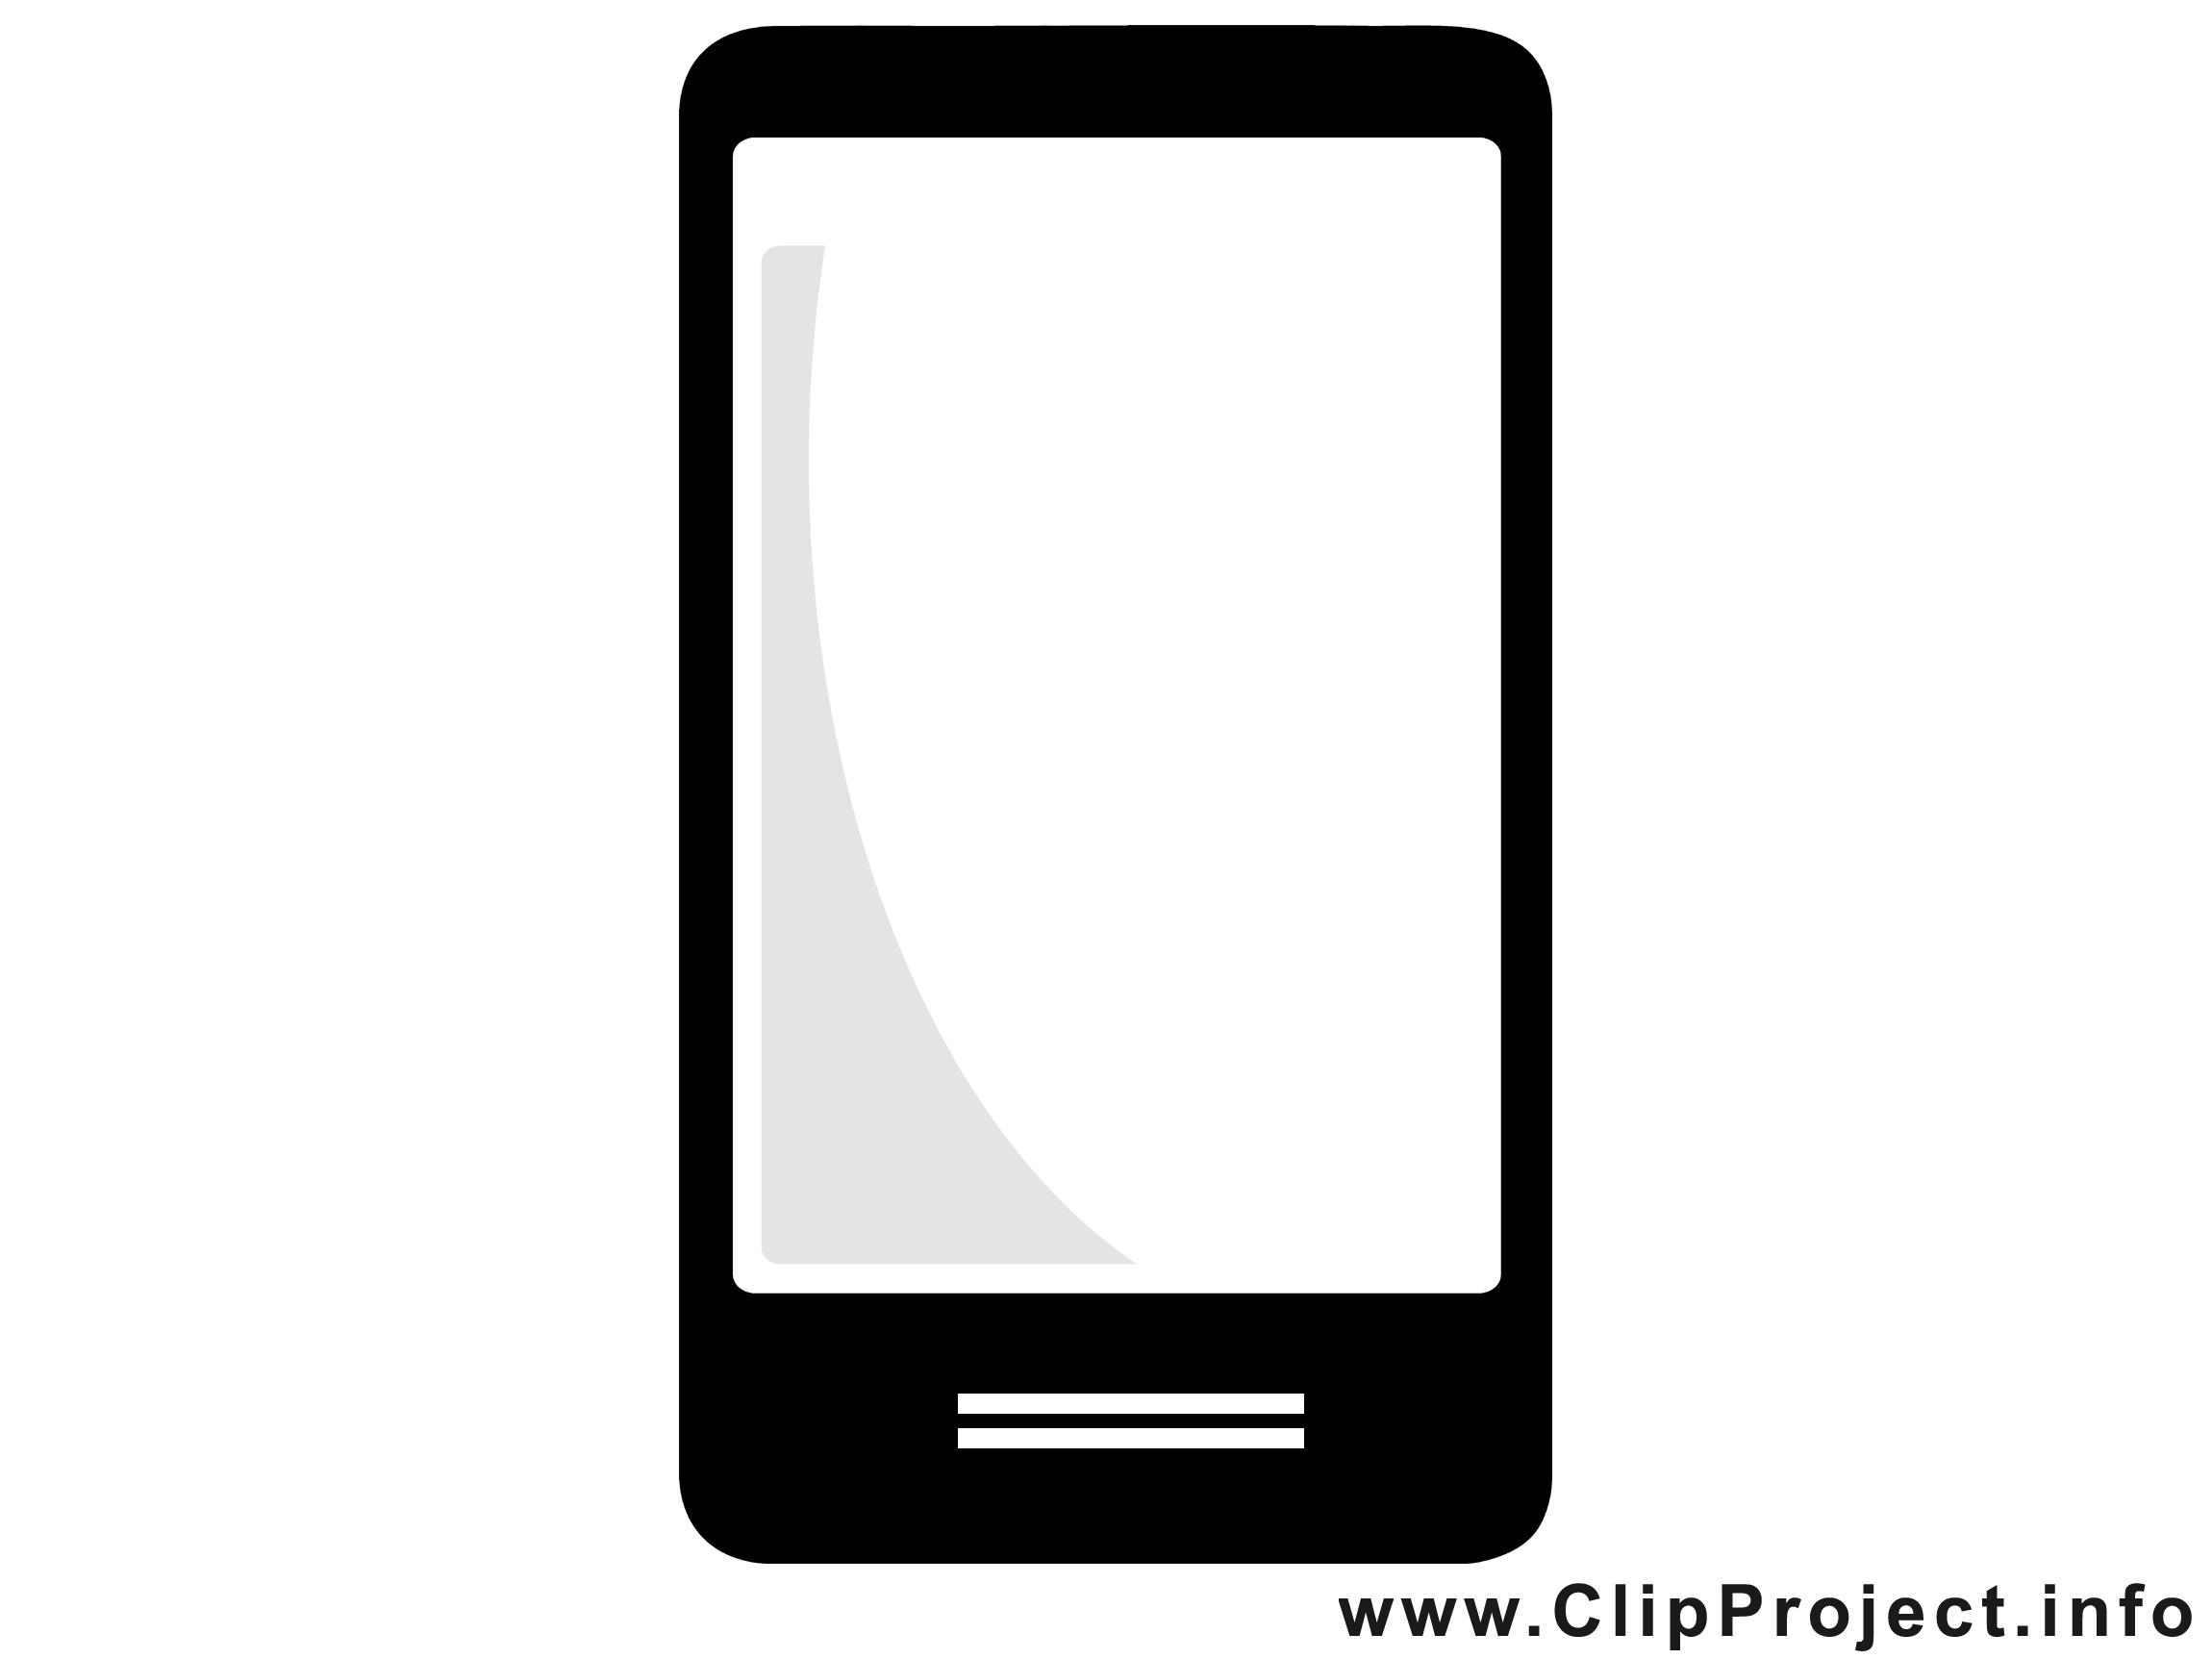 portable image gratuite t l phone cliparts technologie dessin picture image graphic clip. Black Bedroom Furniture Sets. Home Design Ideas